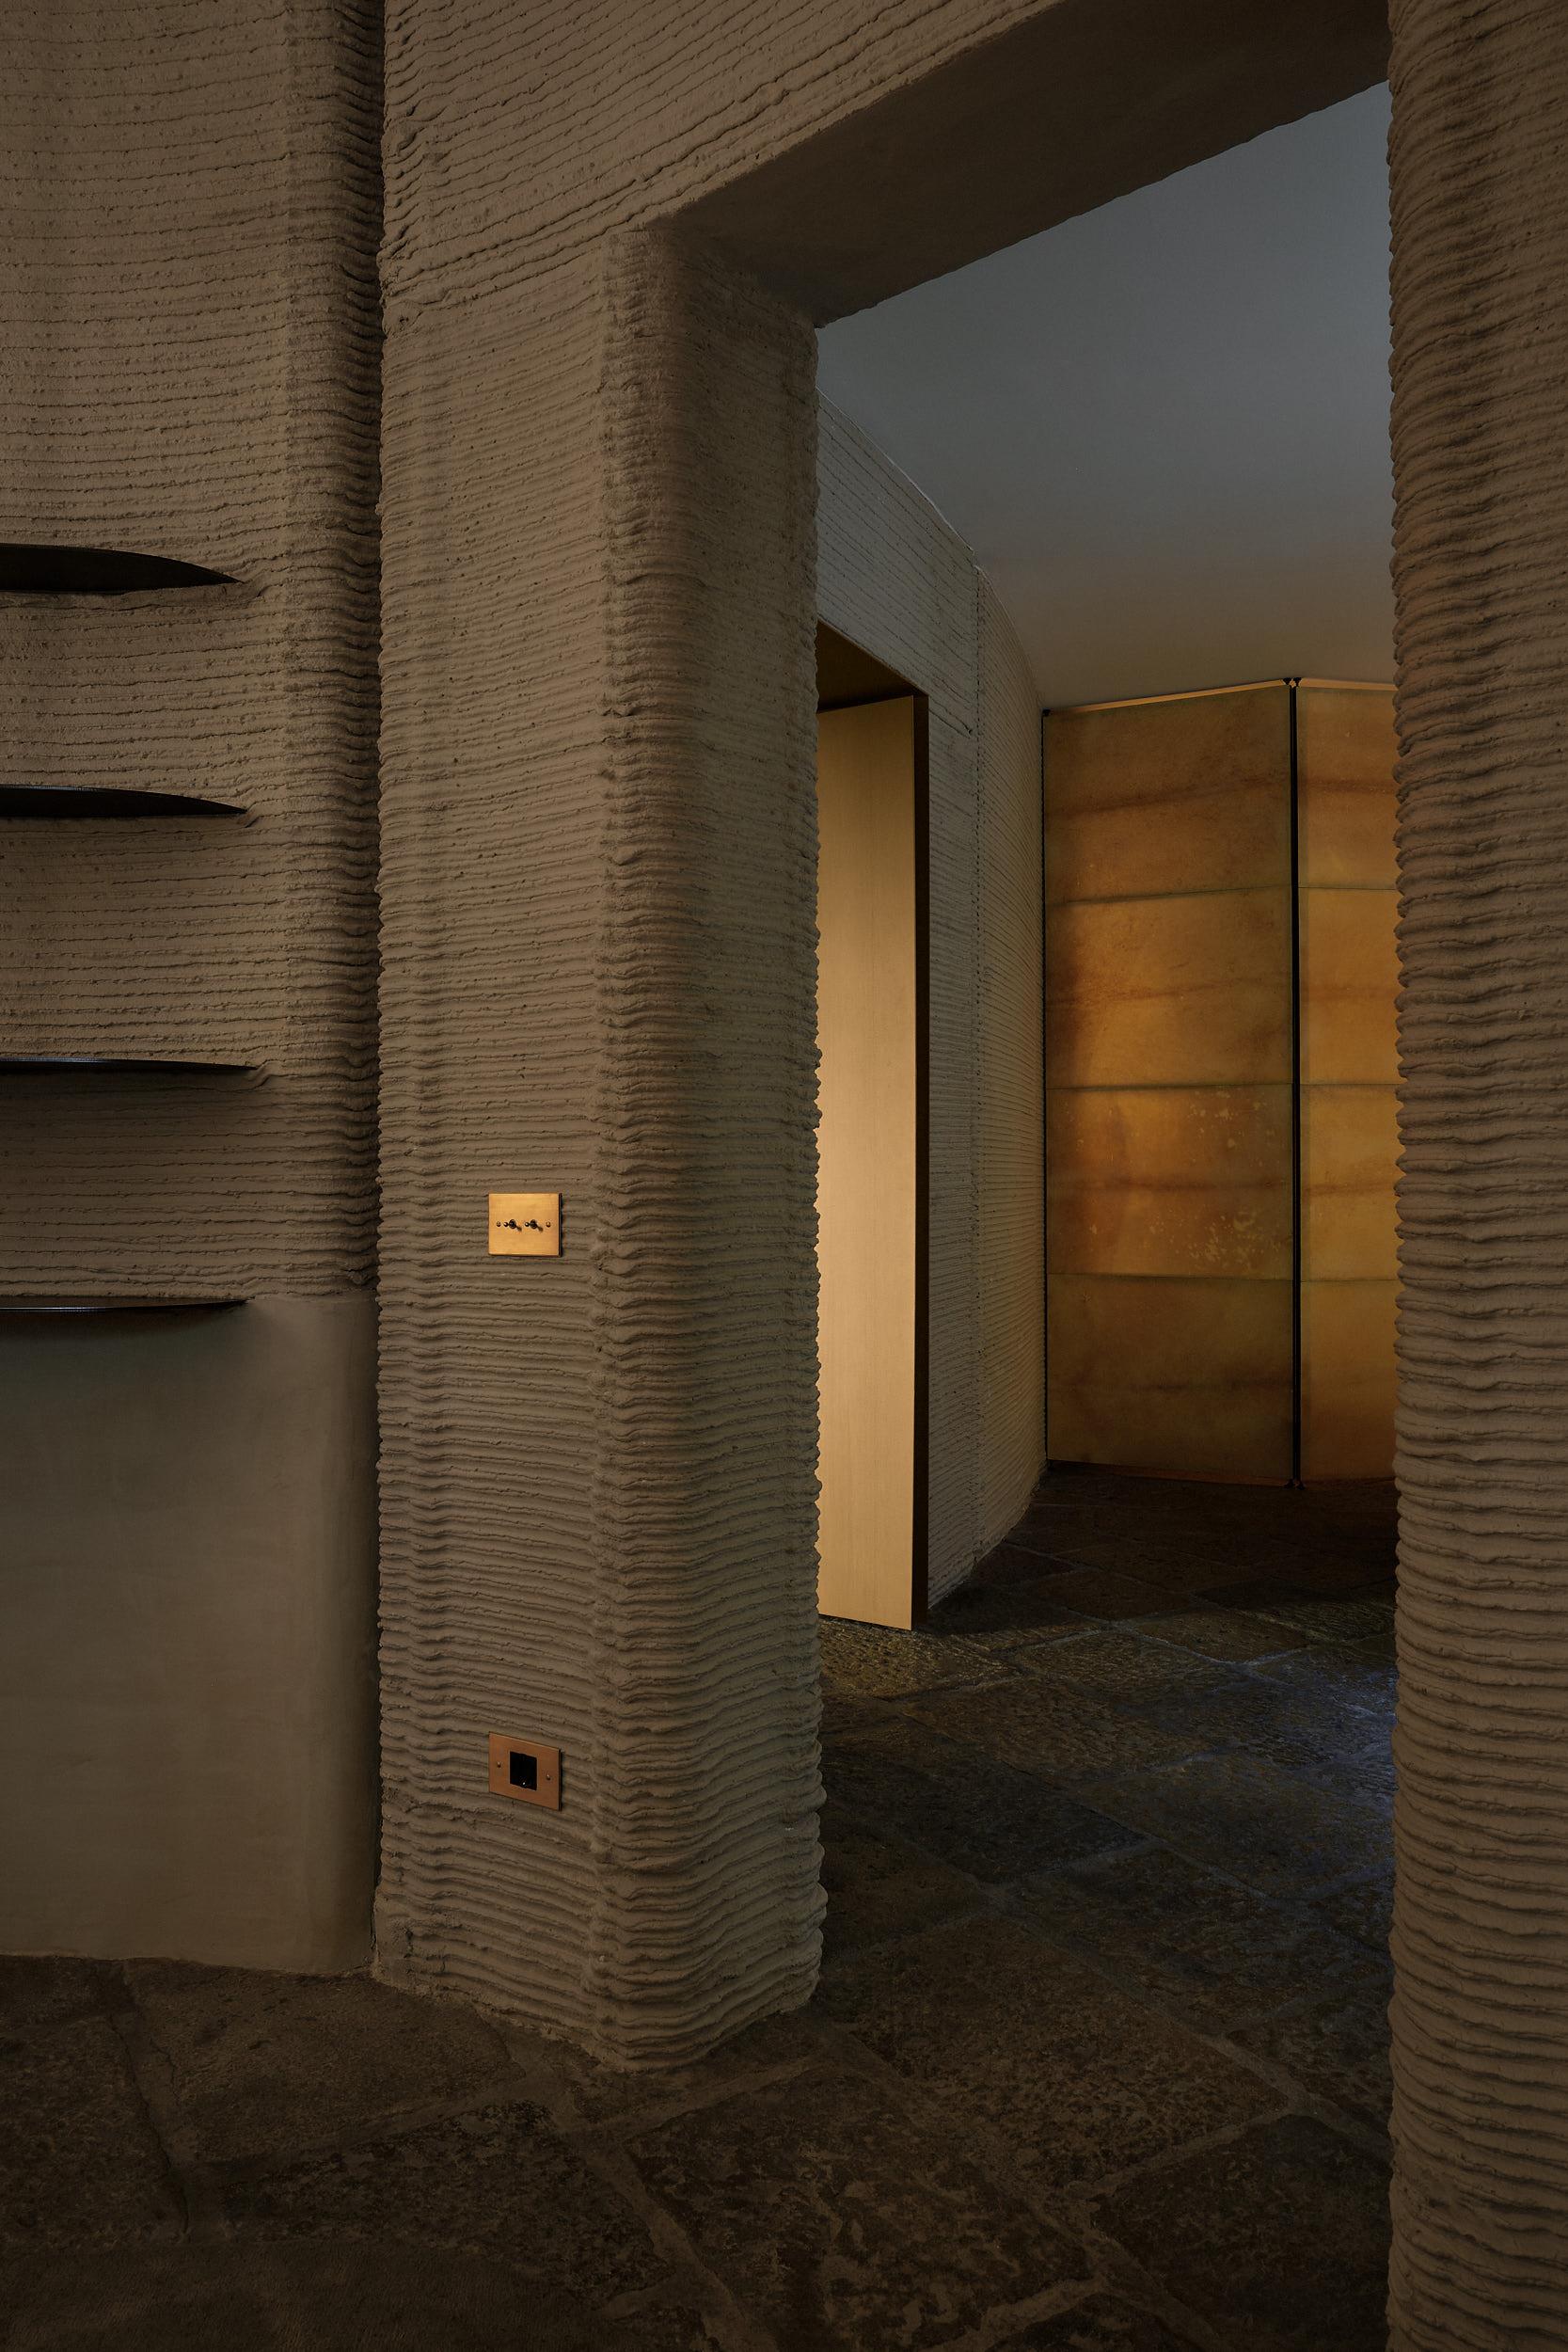 3D Housing 05 by CLS Architetti on Anniversary Magazine. Photo by Alex Lesage — threefold 3.jpg